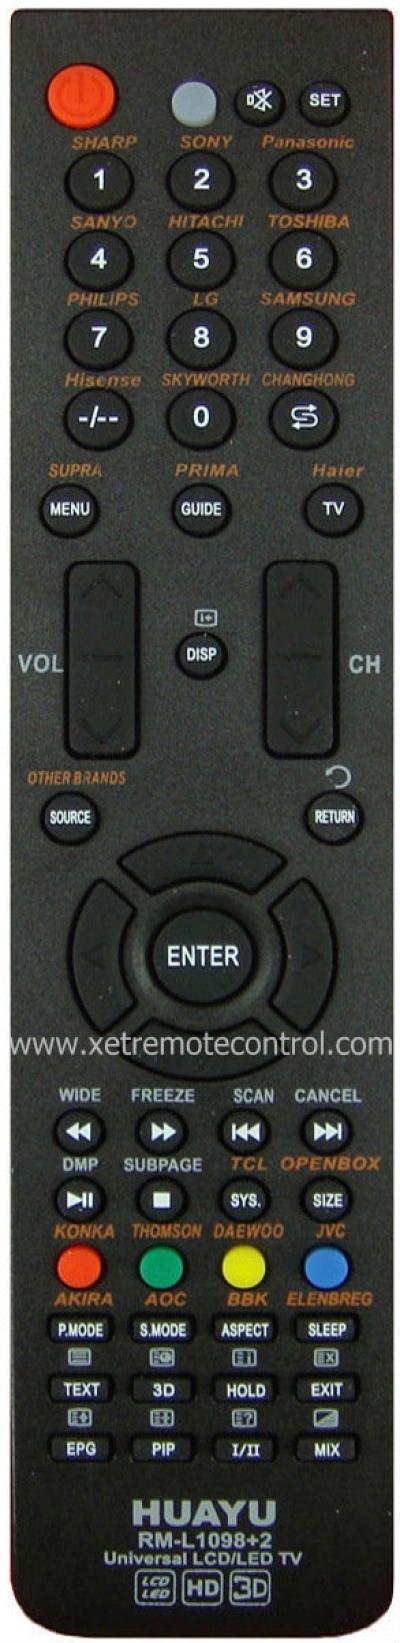 RM-L1098+2 华宇通用万能LED/LCD电视遥控器